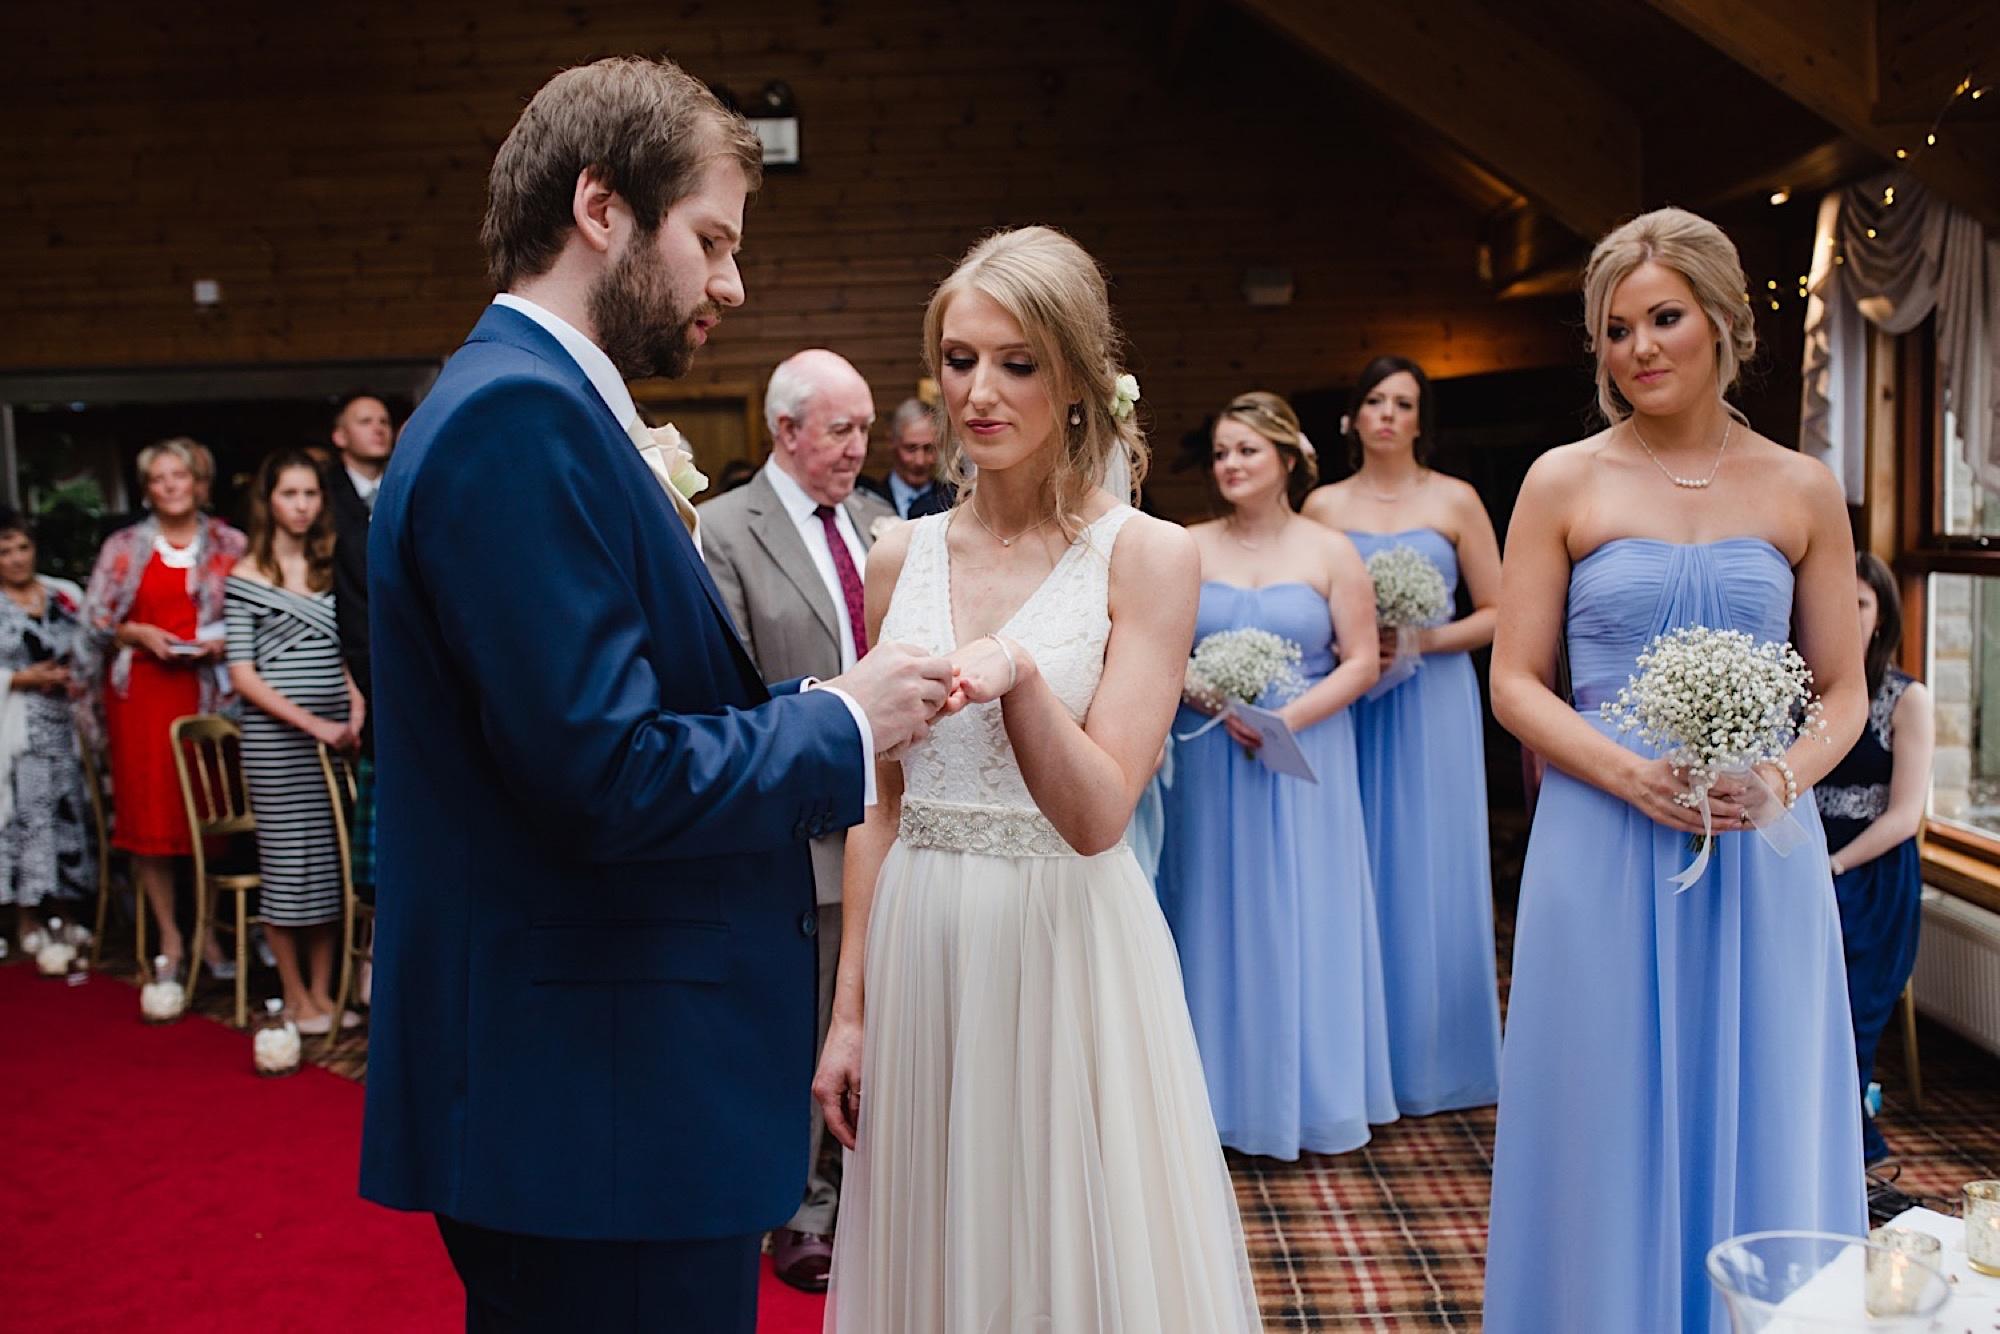 bride and groom exchanging wedding rings